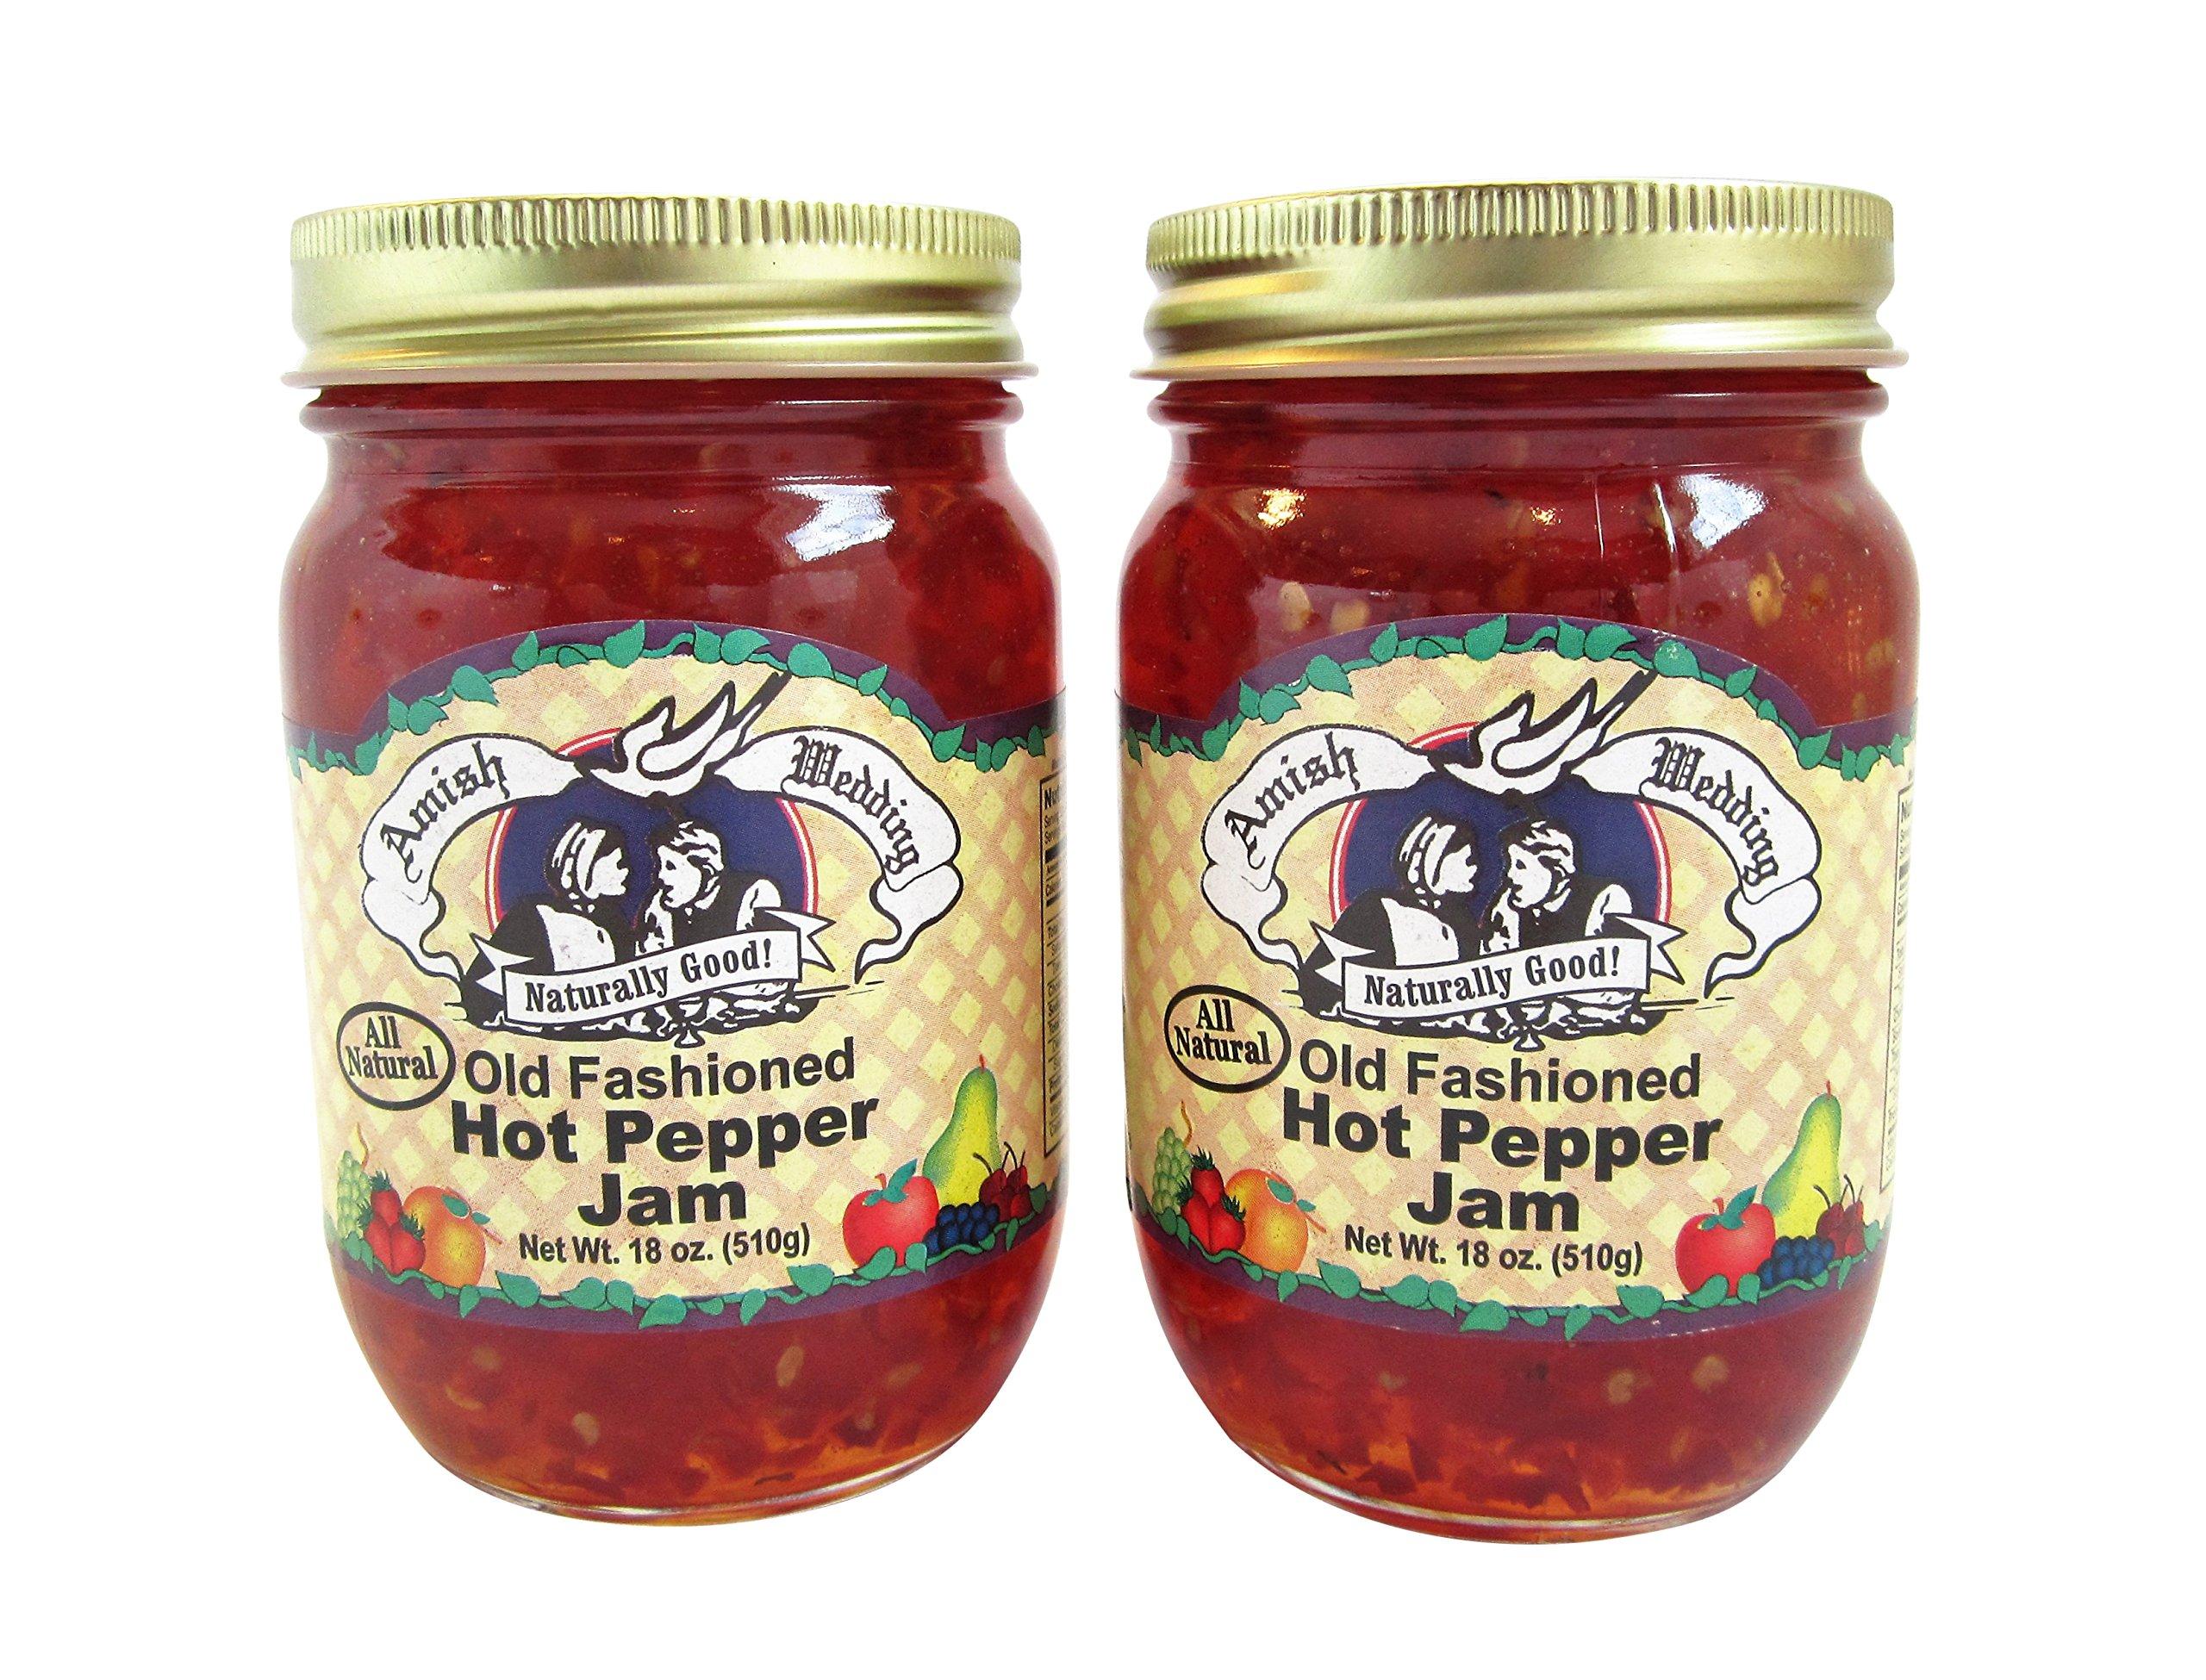 Amish Wedding Foods Old Fashioned Hot Pepper Jam All Natural 2 - 18 oz. Jars